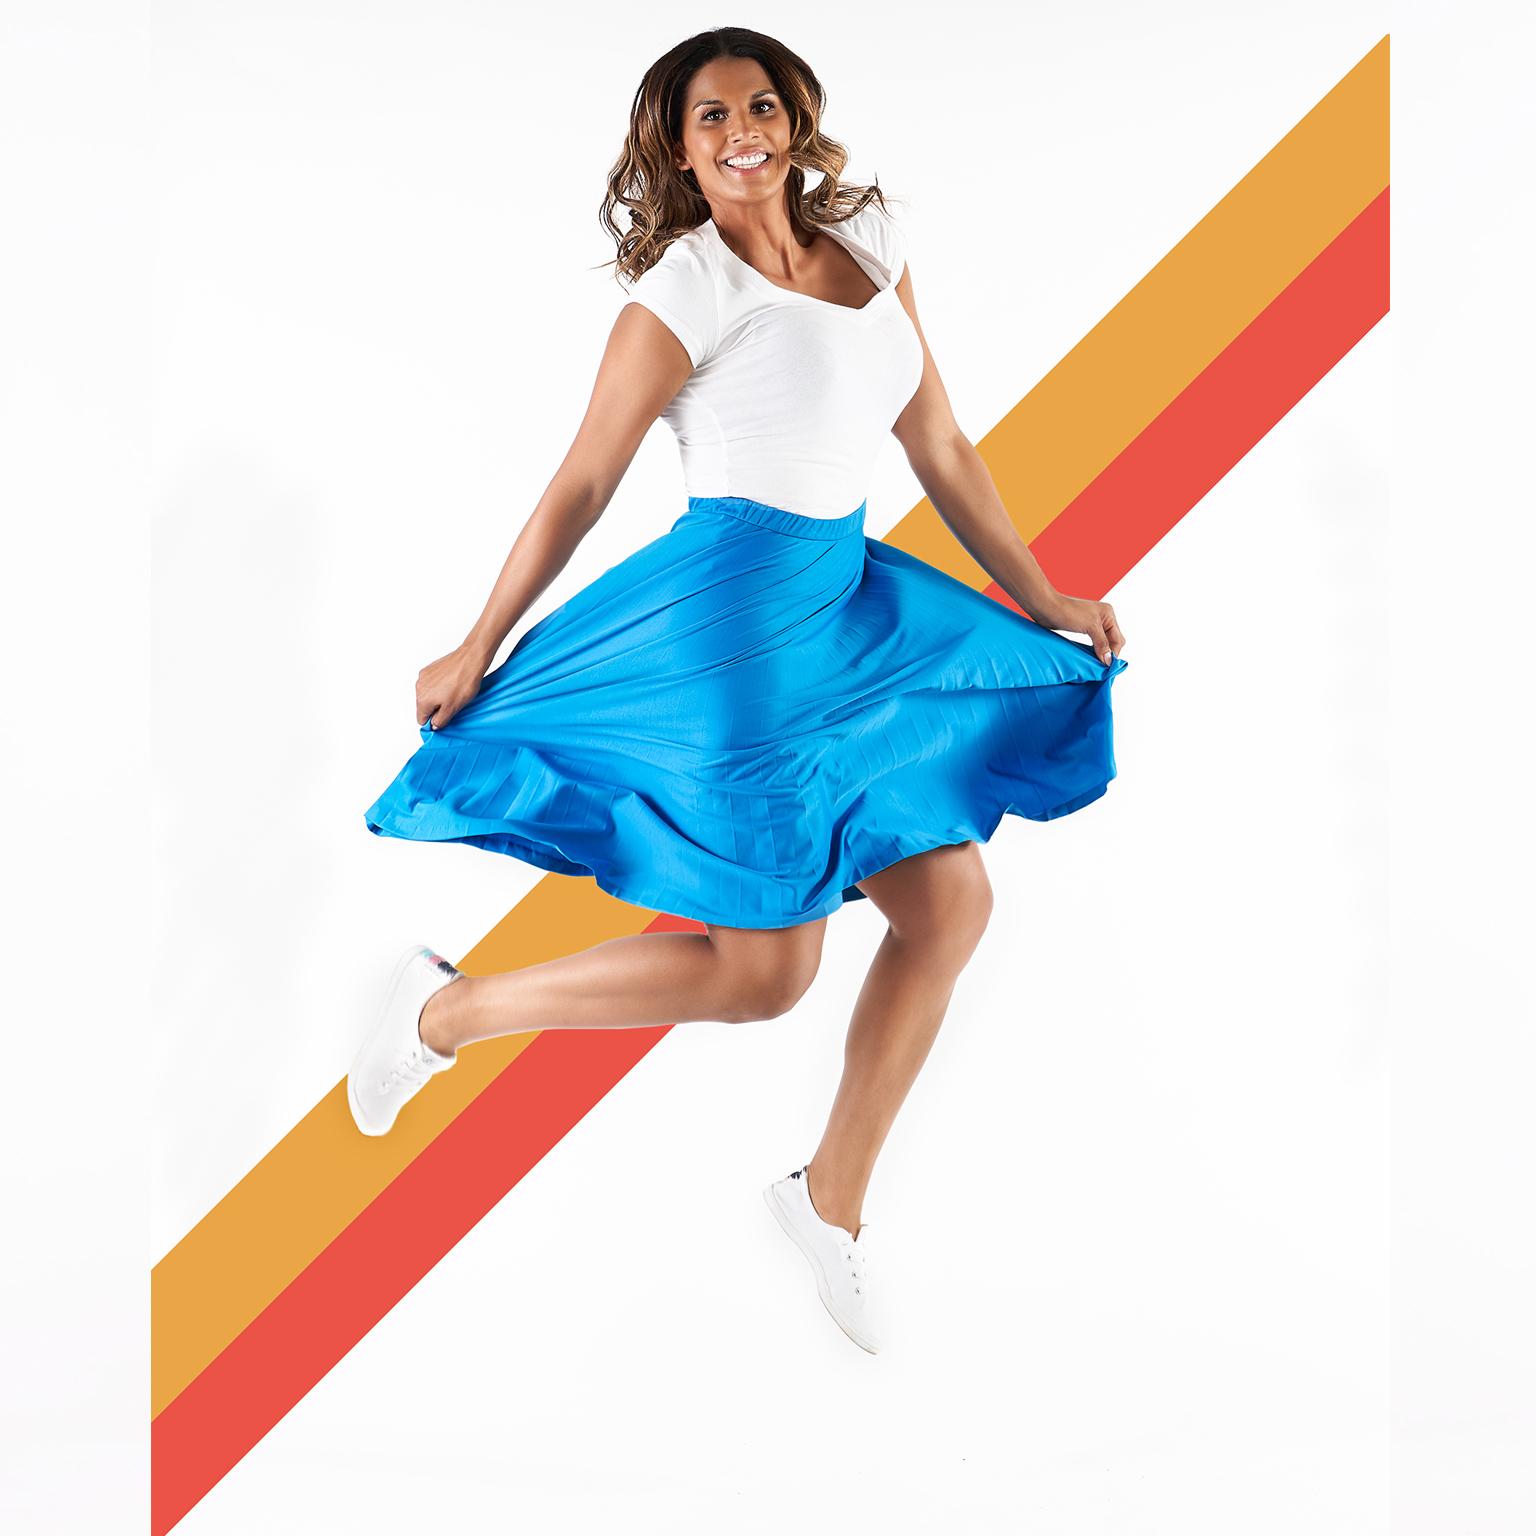 Toronto-Fitness-Model-Agency-Fashion-Lifestyle-Valerie-Saunders